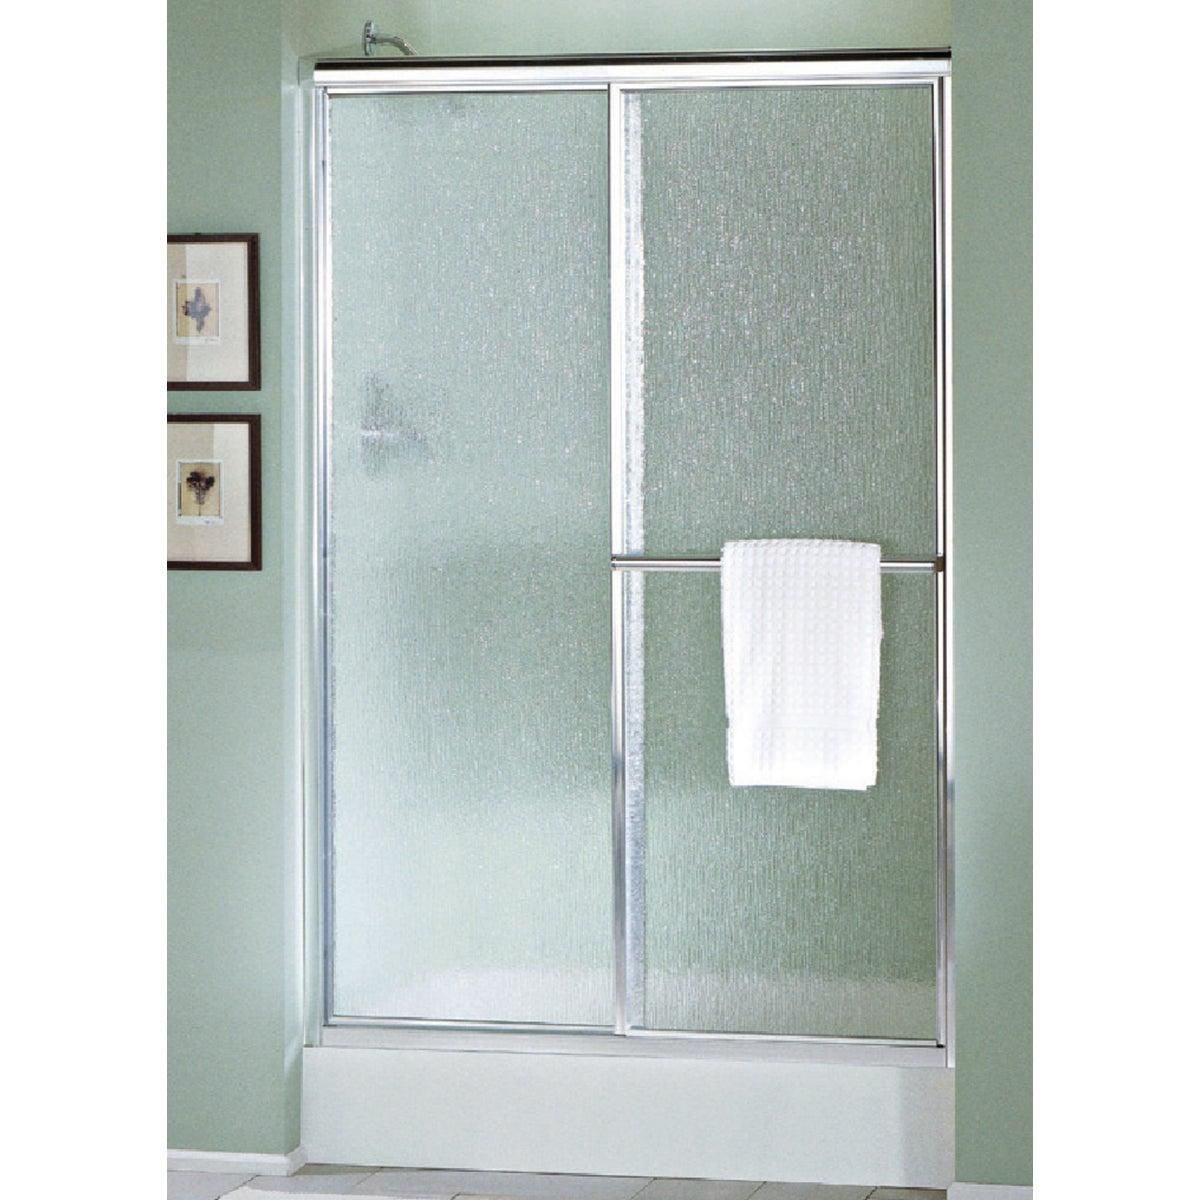 Sterling SILVER/RAIN SHOWER DOOR 5976-48S